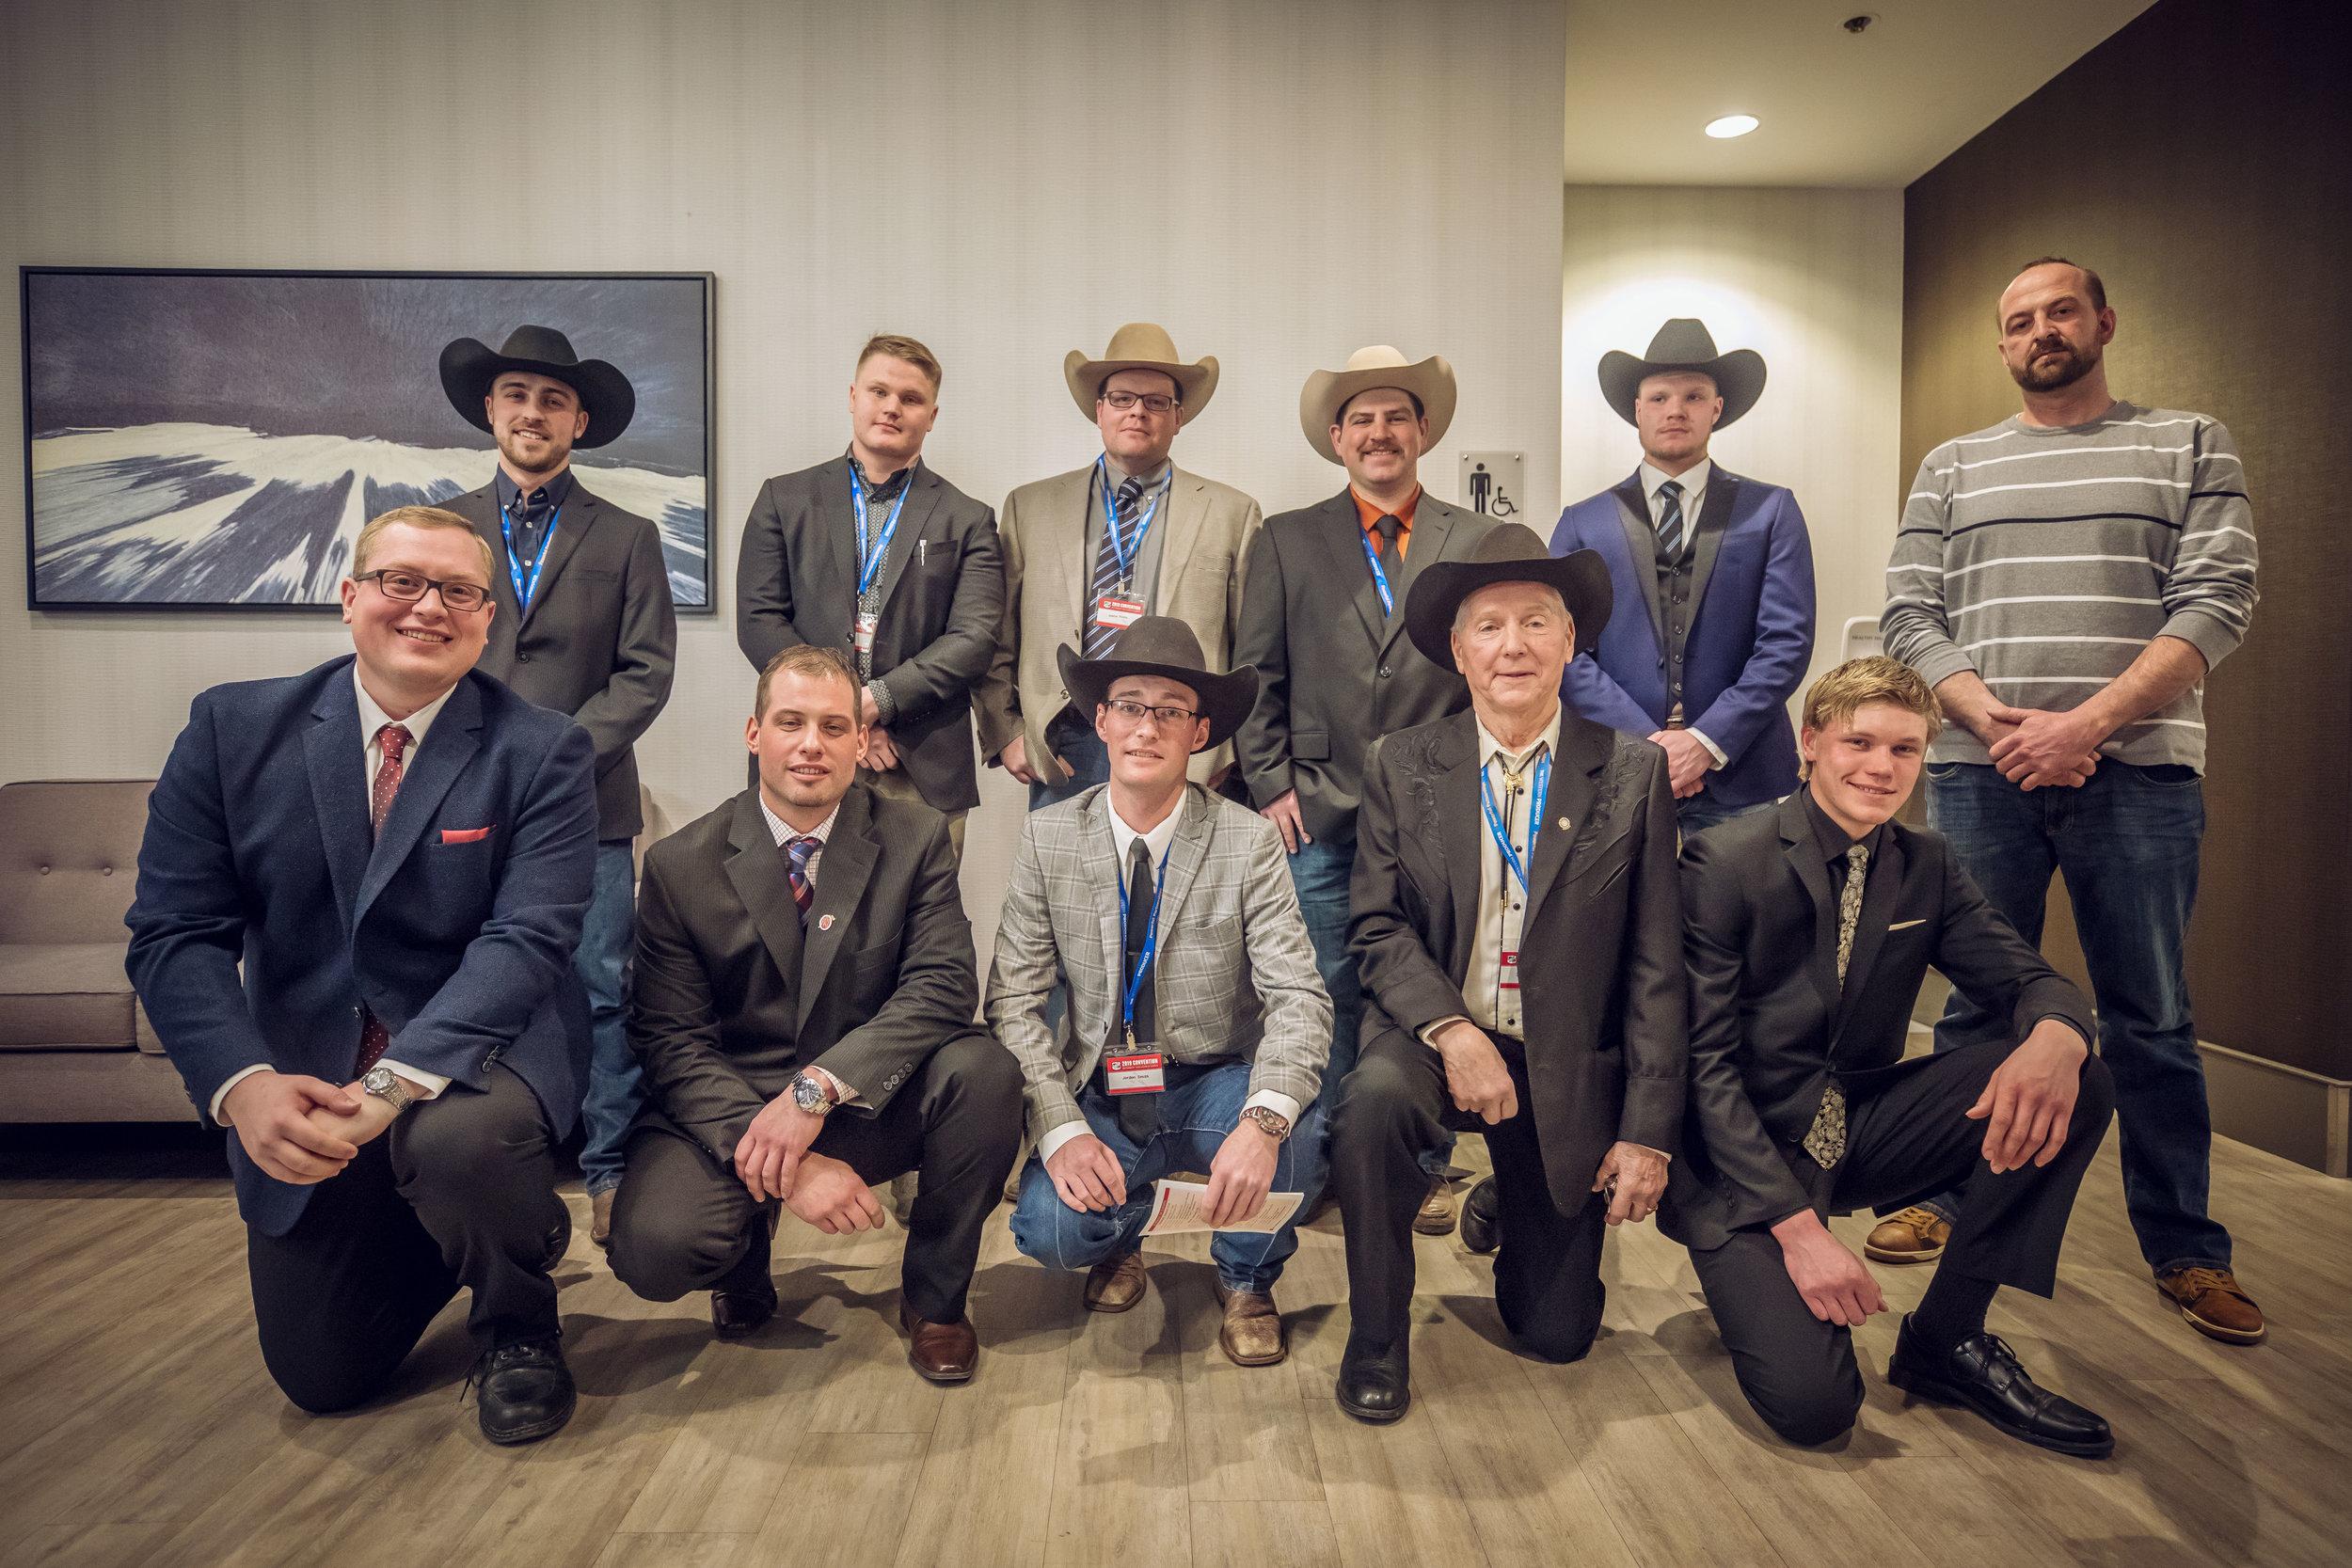 2019 02-01 Alberta Auctioneer Convention Day 02 - Calgary 01 (1).jpg